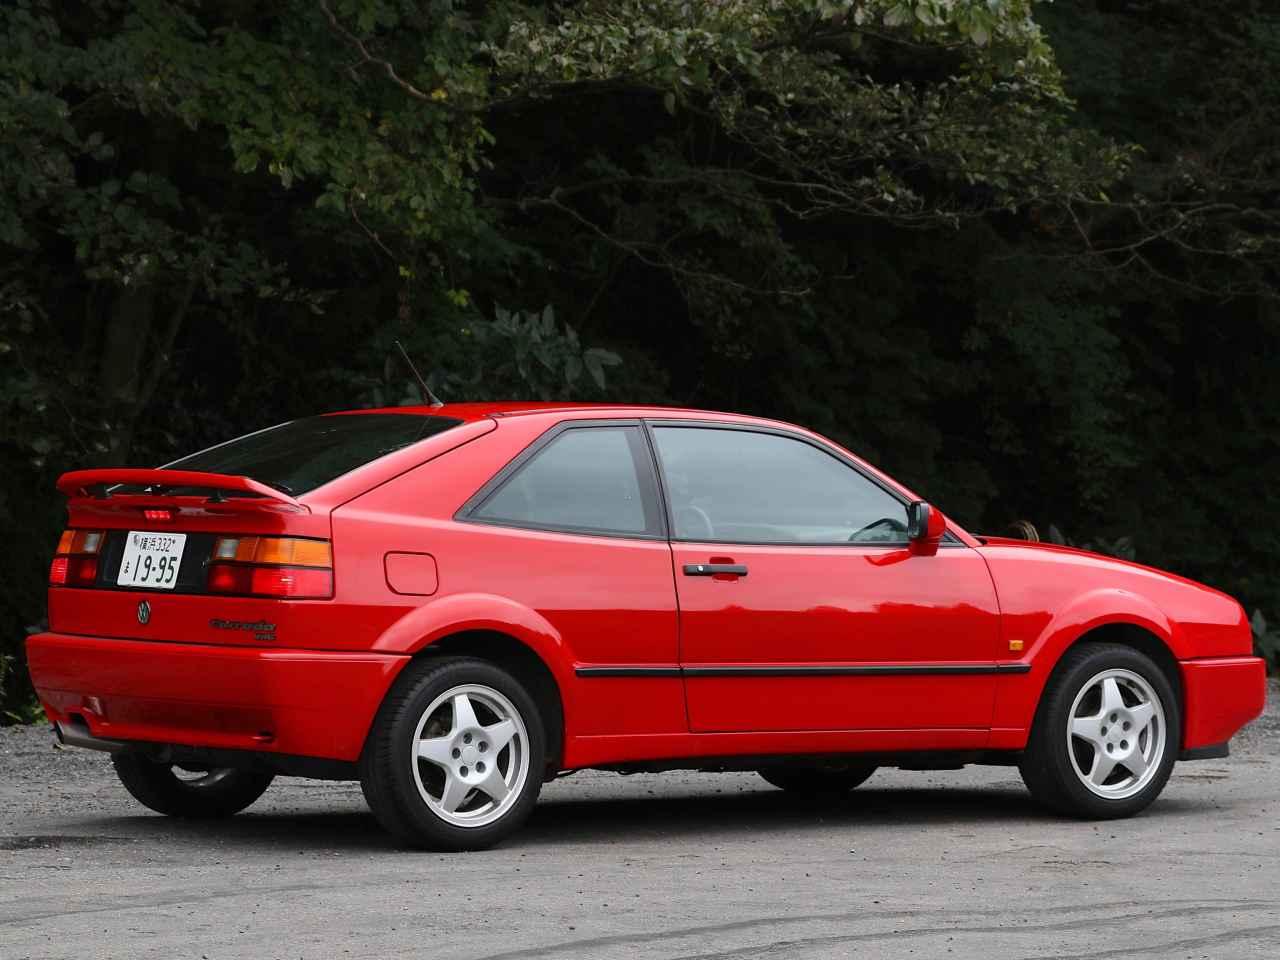 161101-Corrado-EXT3-14.jpg